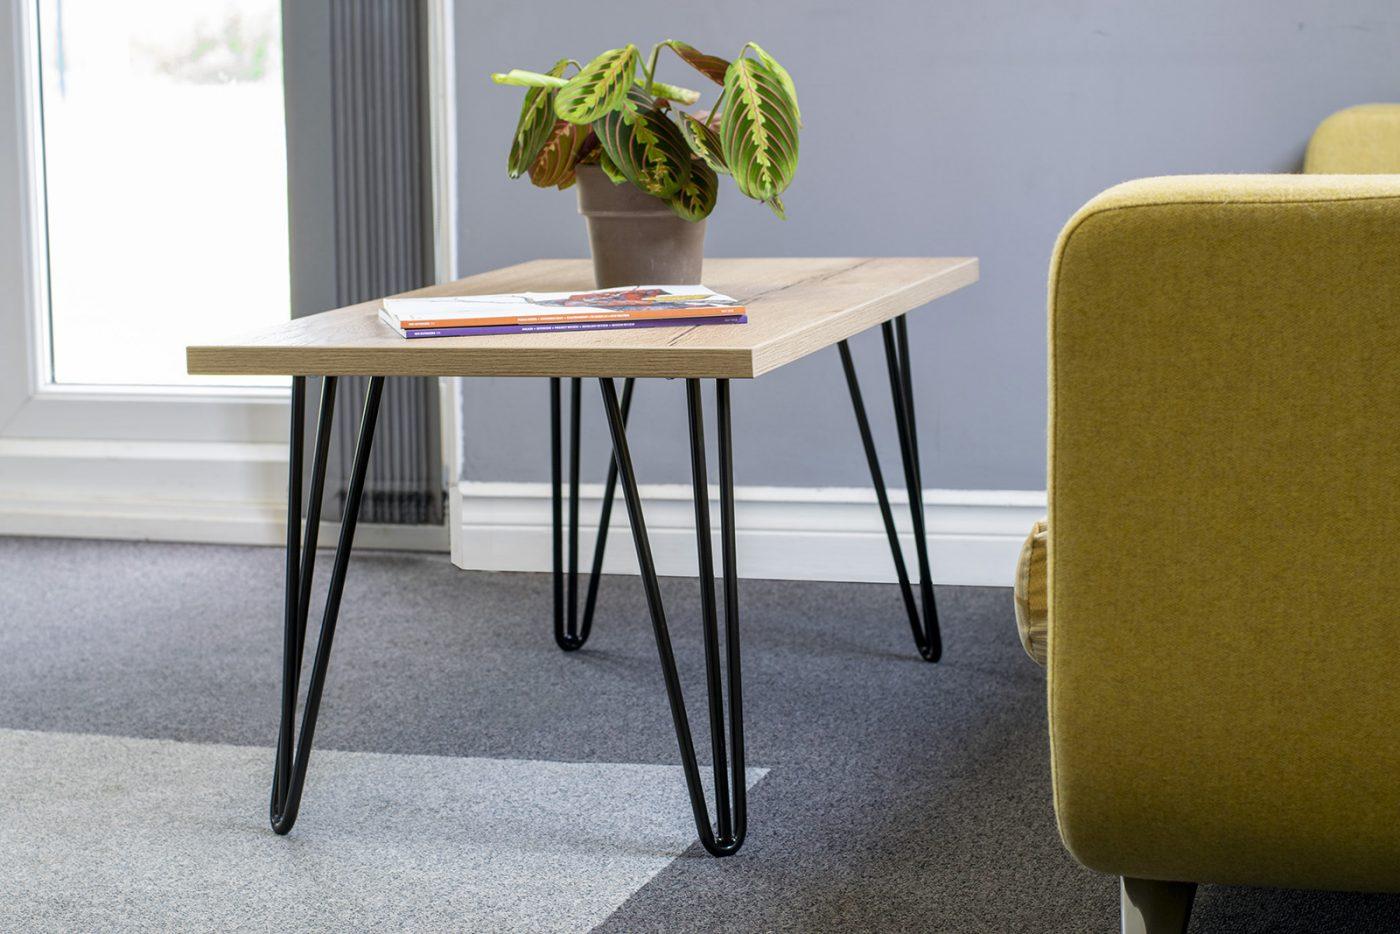 hairpin leg coffee table, contemporary table, reception table, breakout table, oak, grained oak, rectangular table, metal leg table, black legs